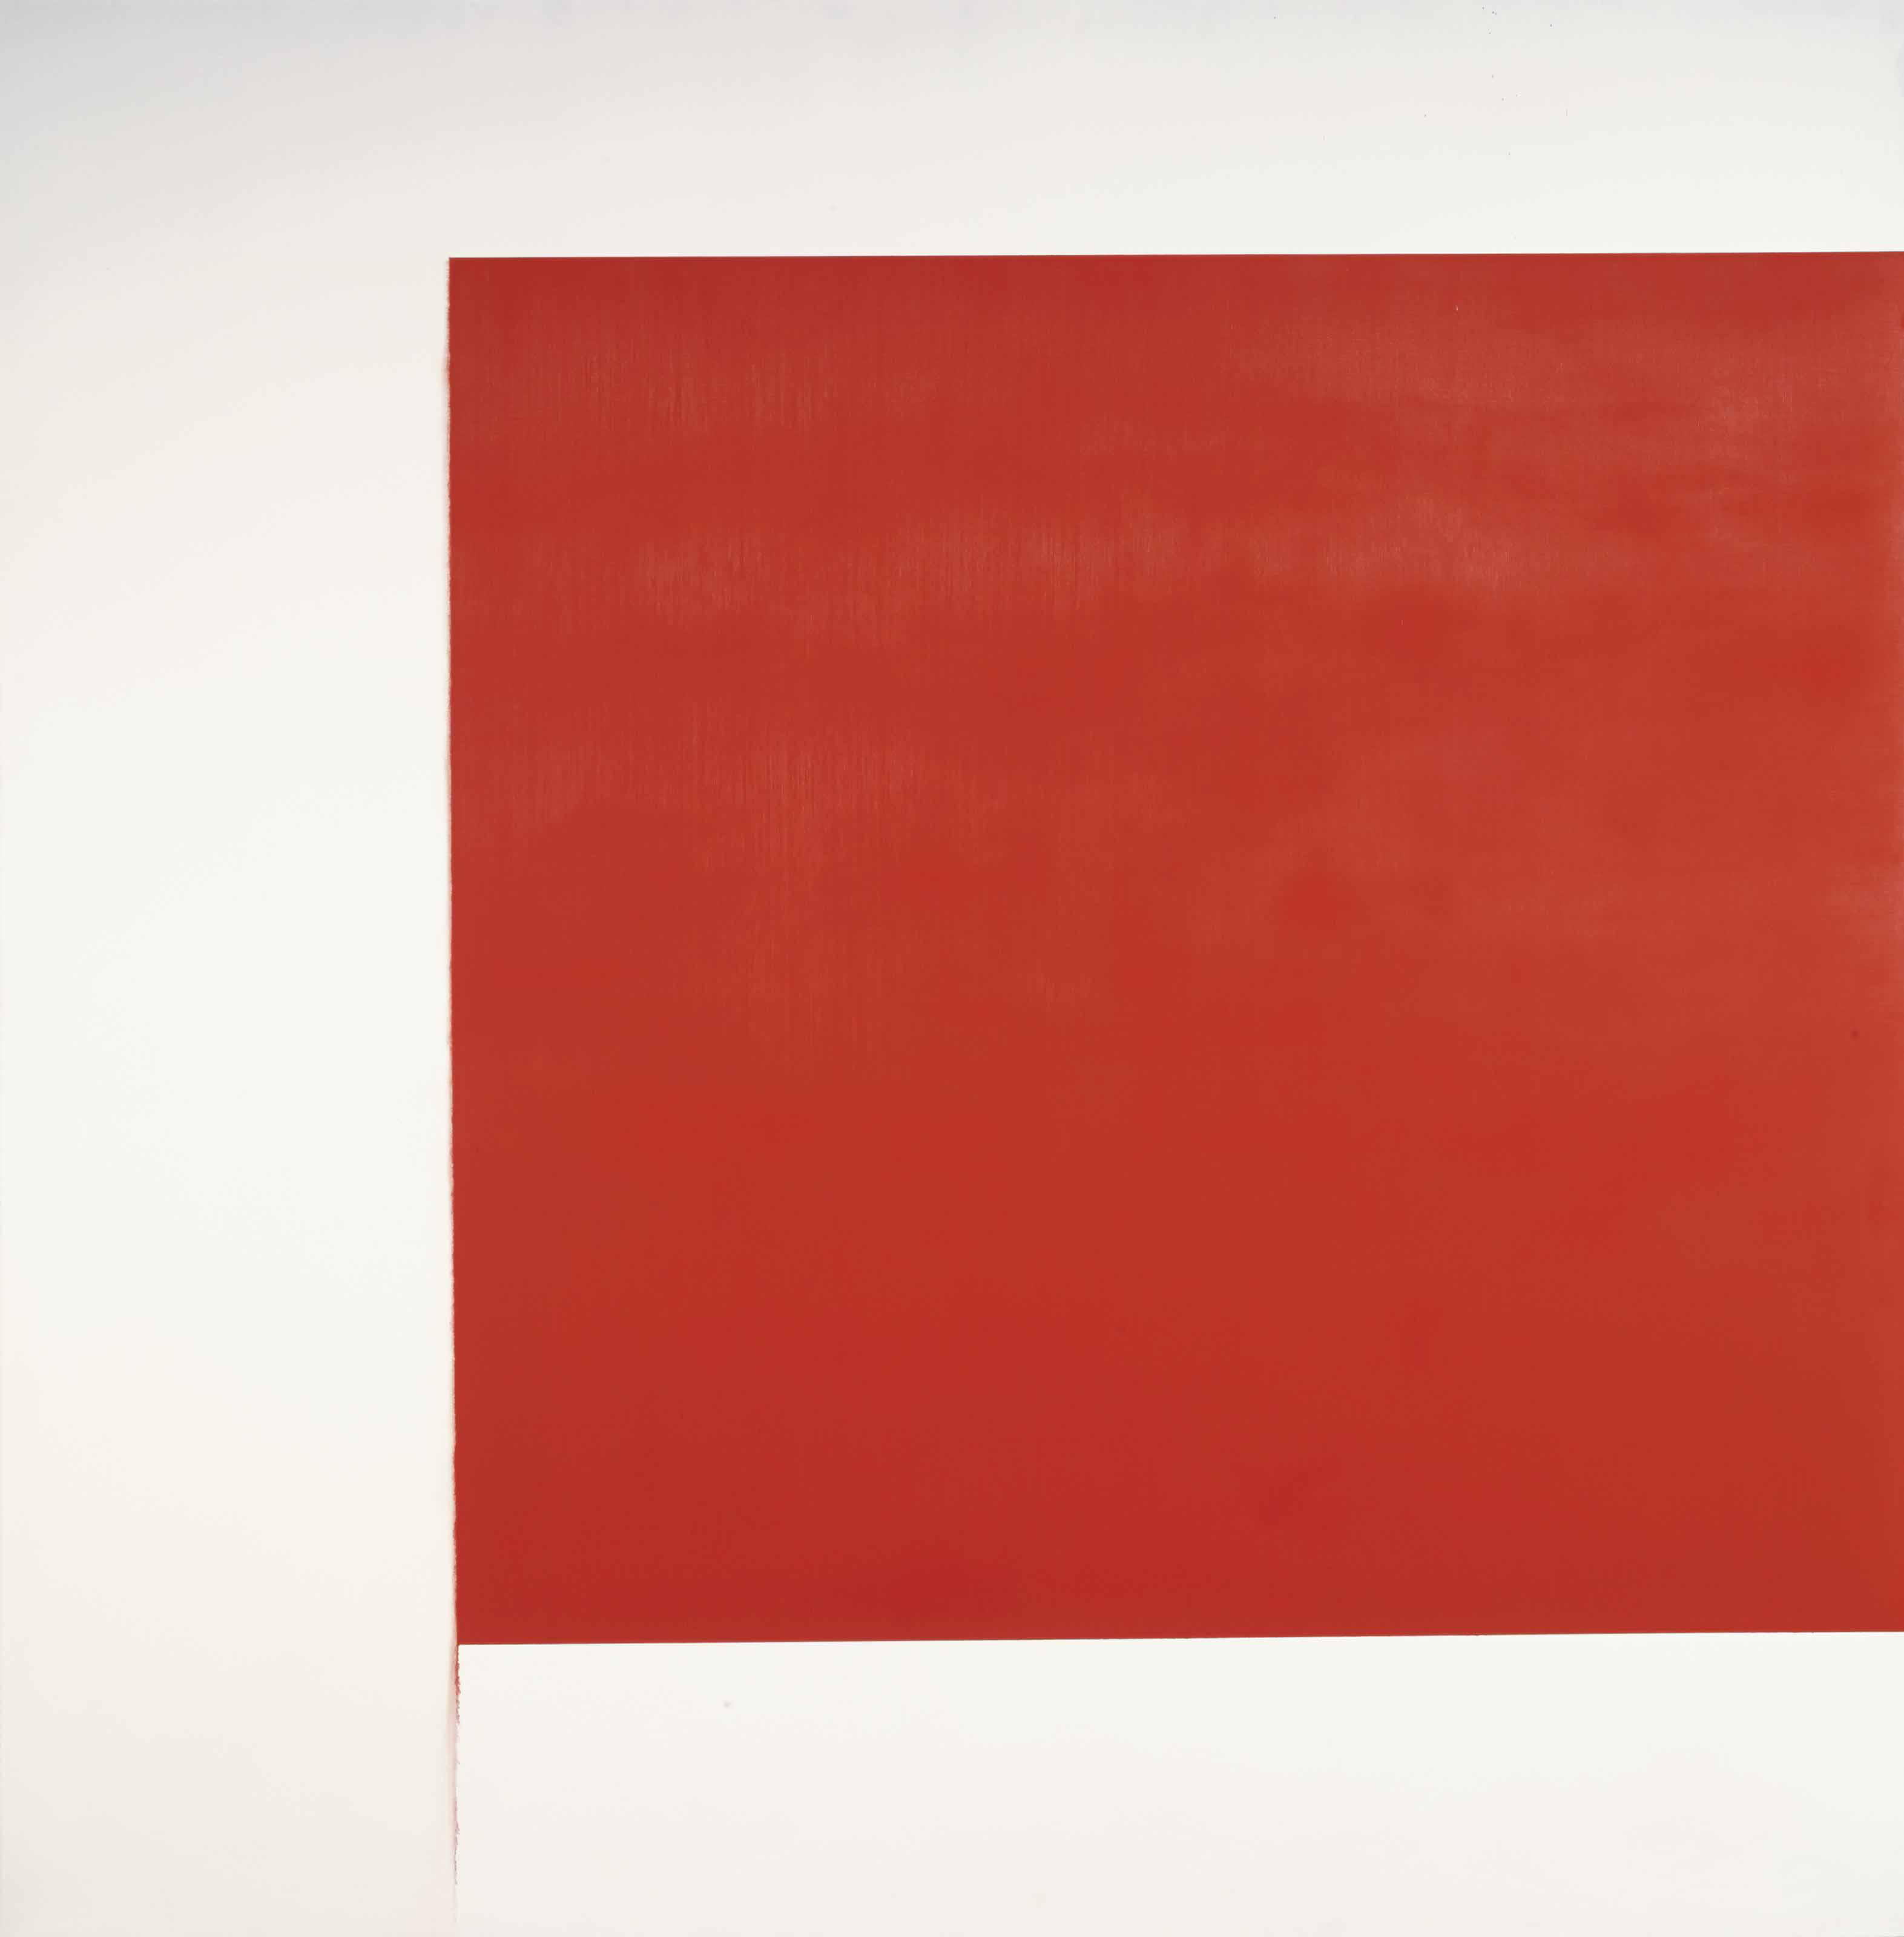 Exposed Painting Cadmium Red Pale